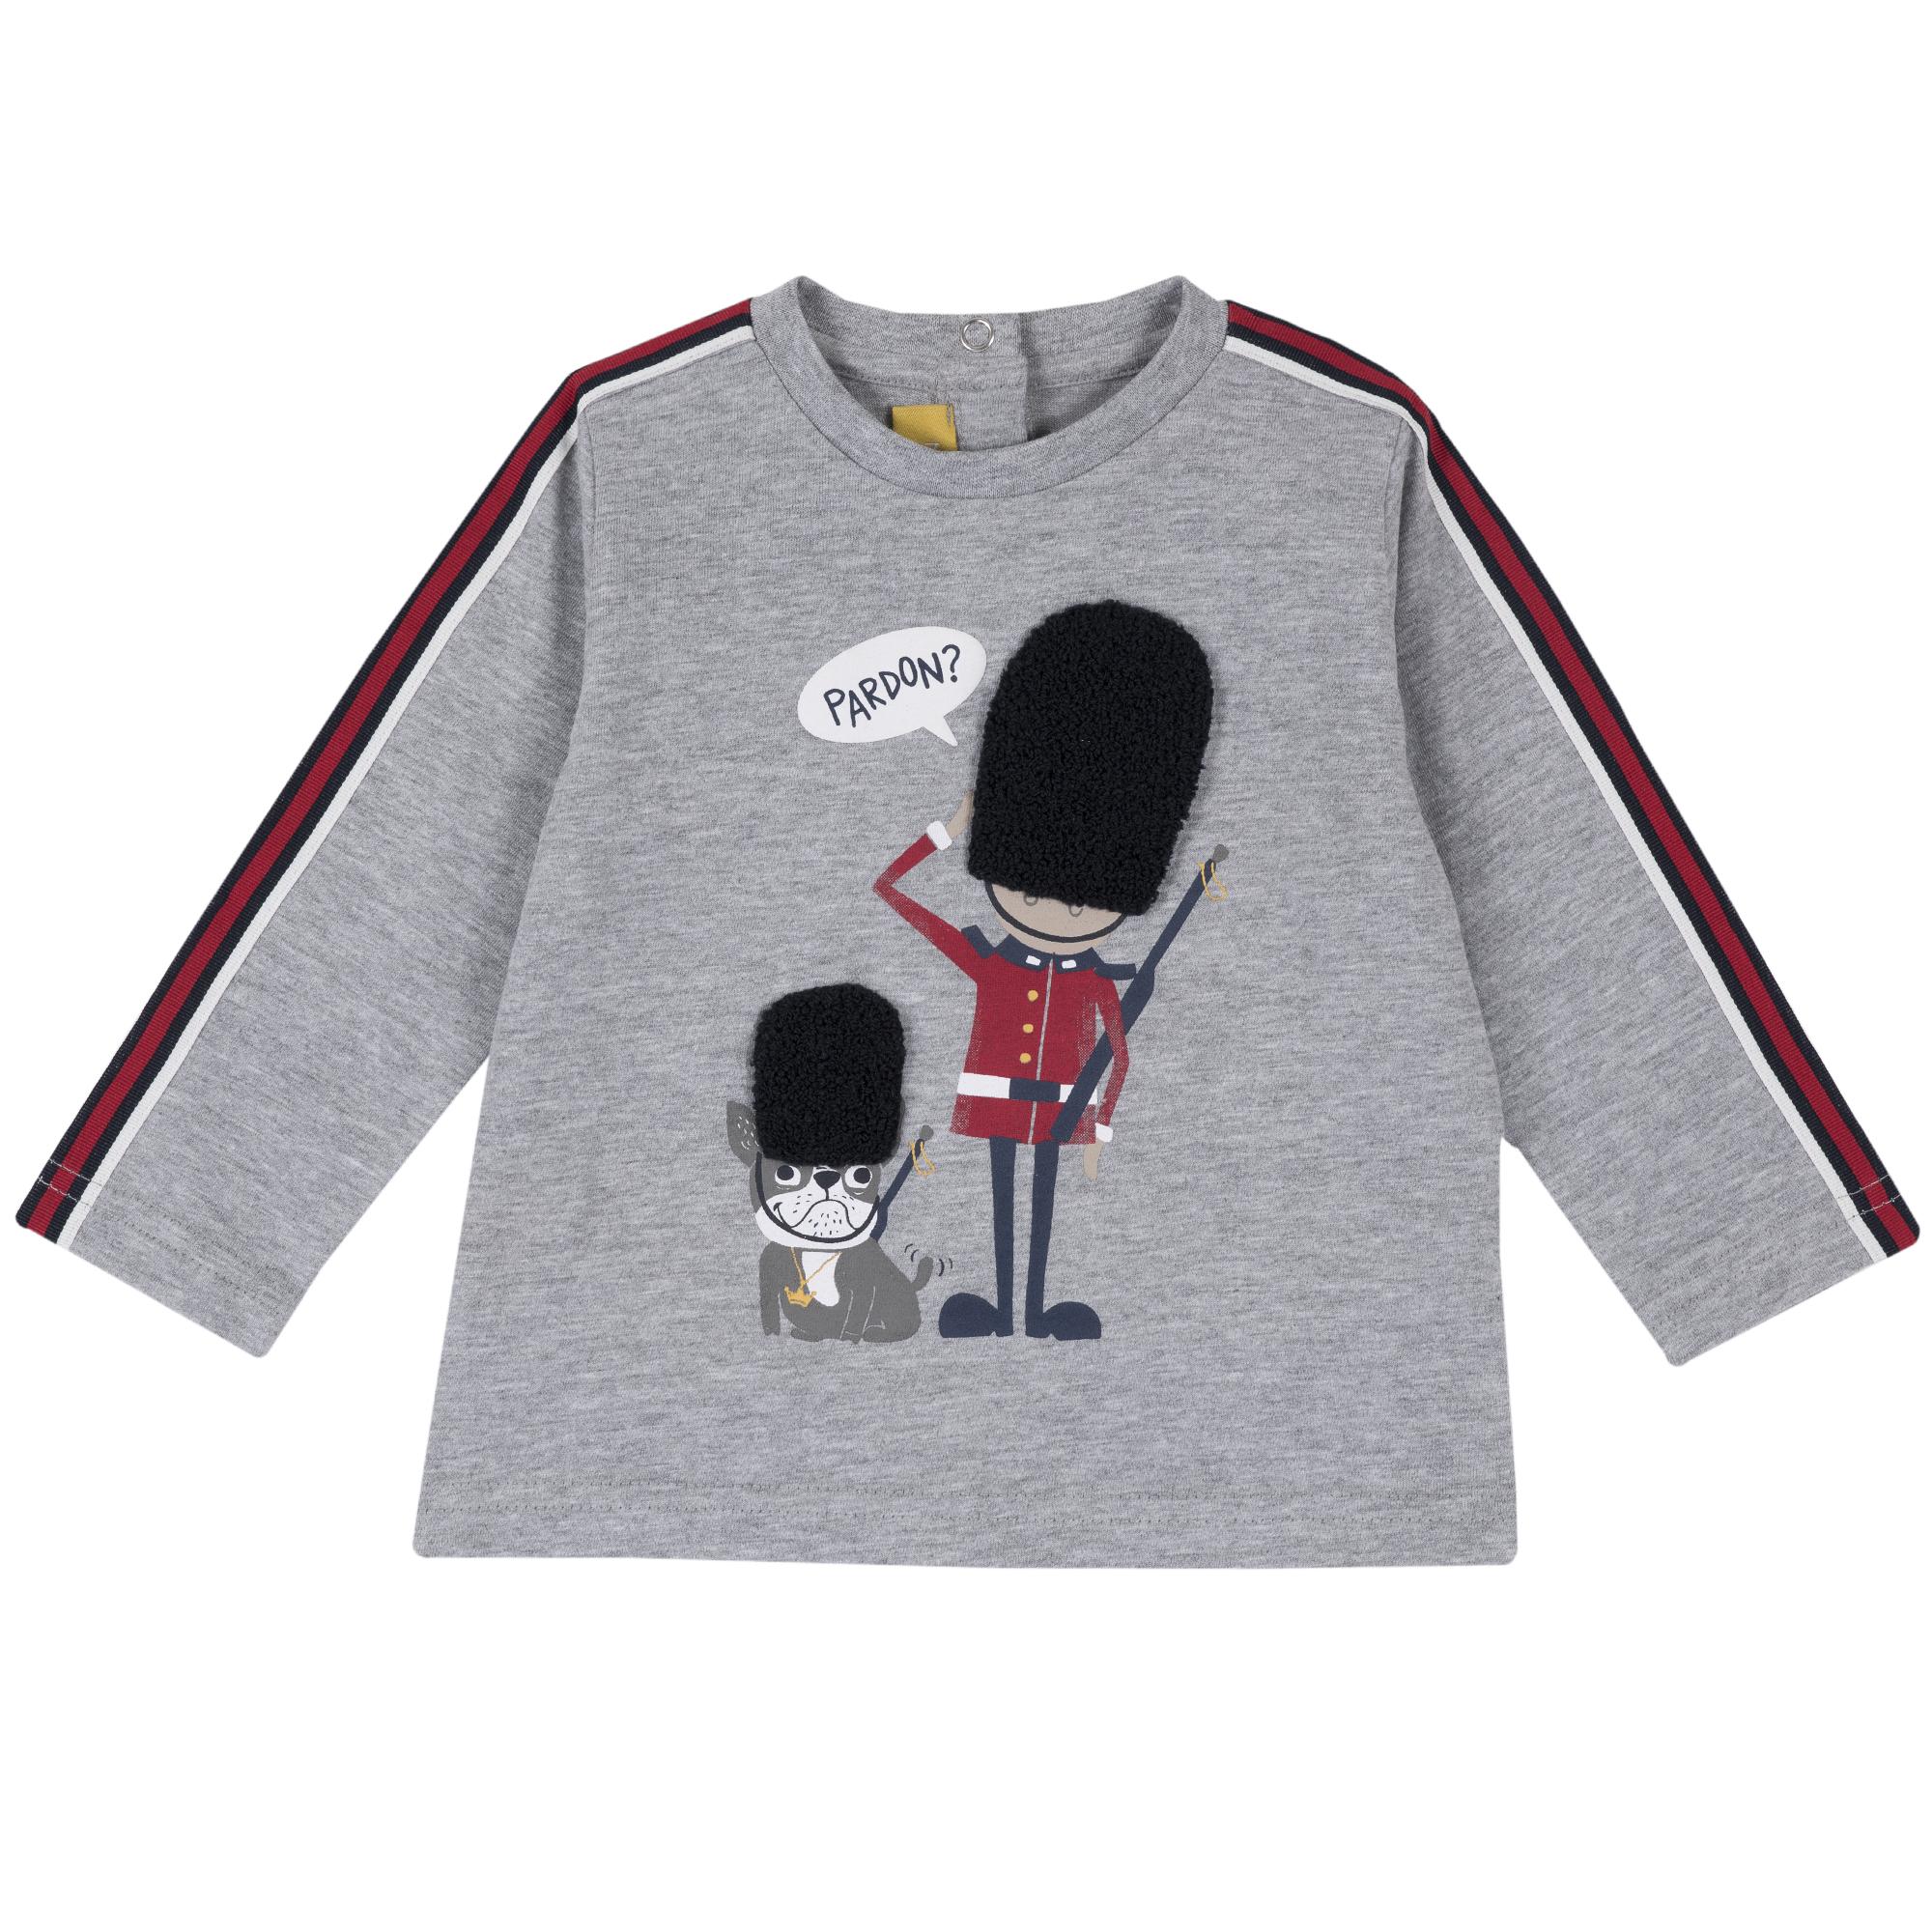 Tricou copii Chicco, maneca lunga, motive britanice, 06792 din categoria Tricouri copii